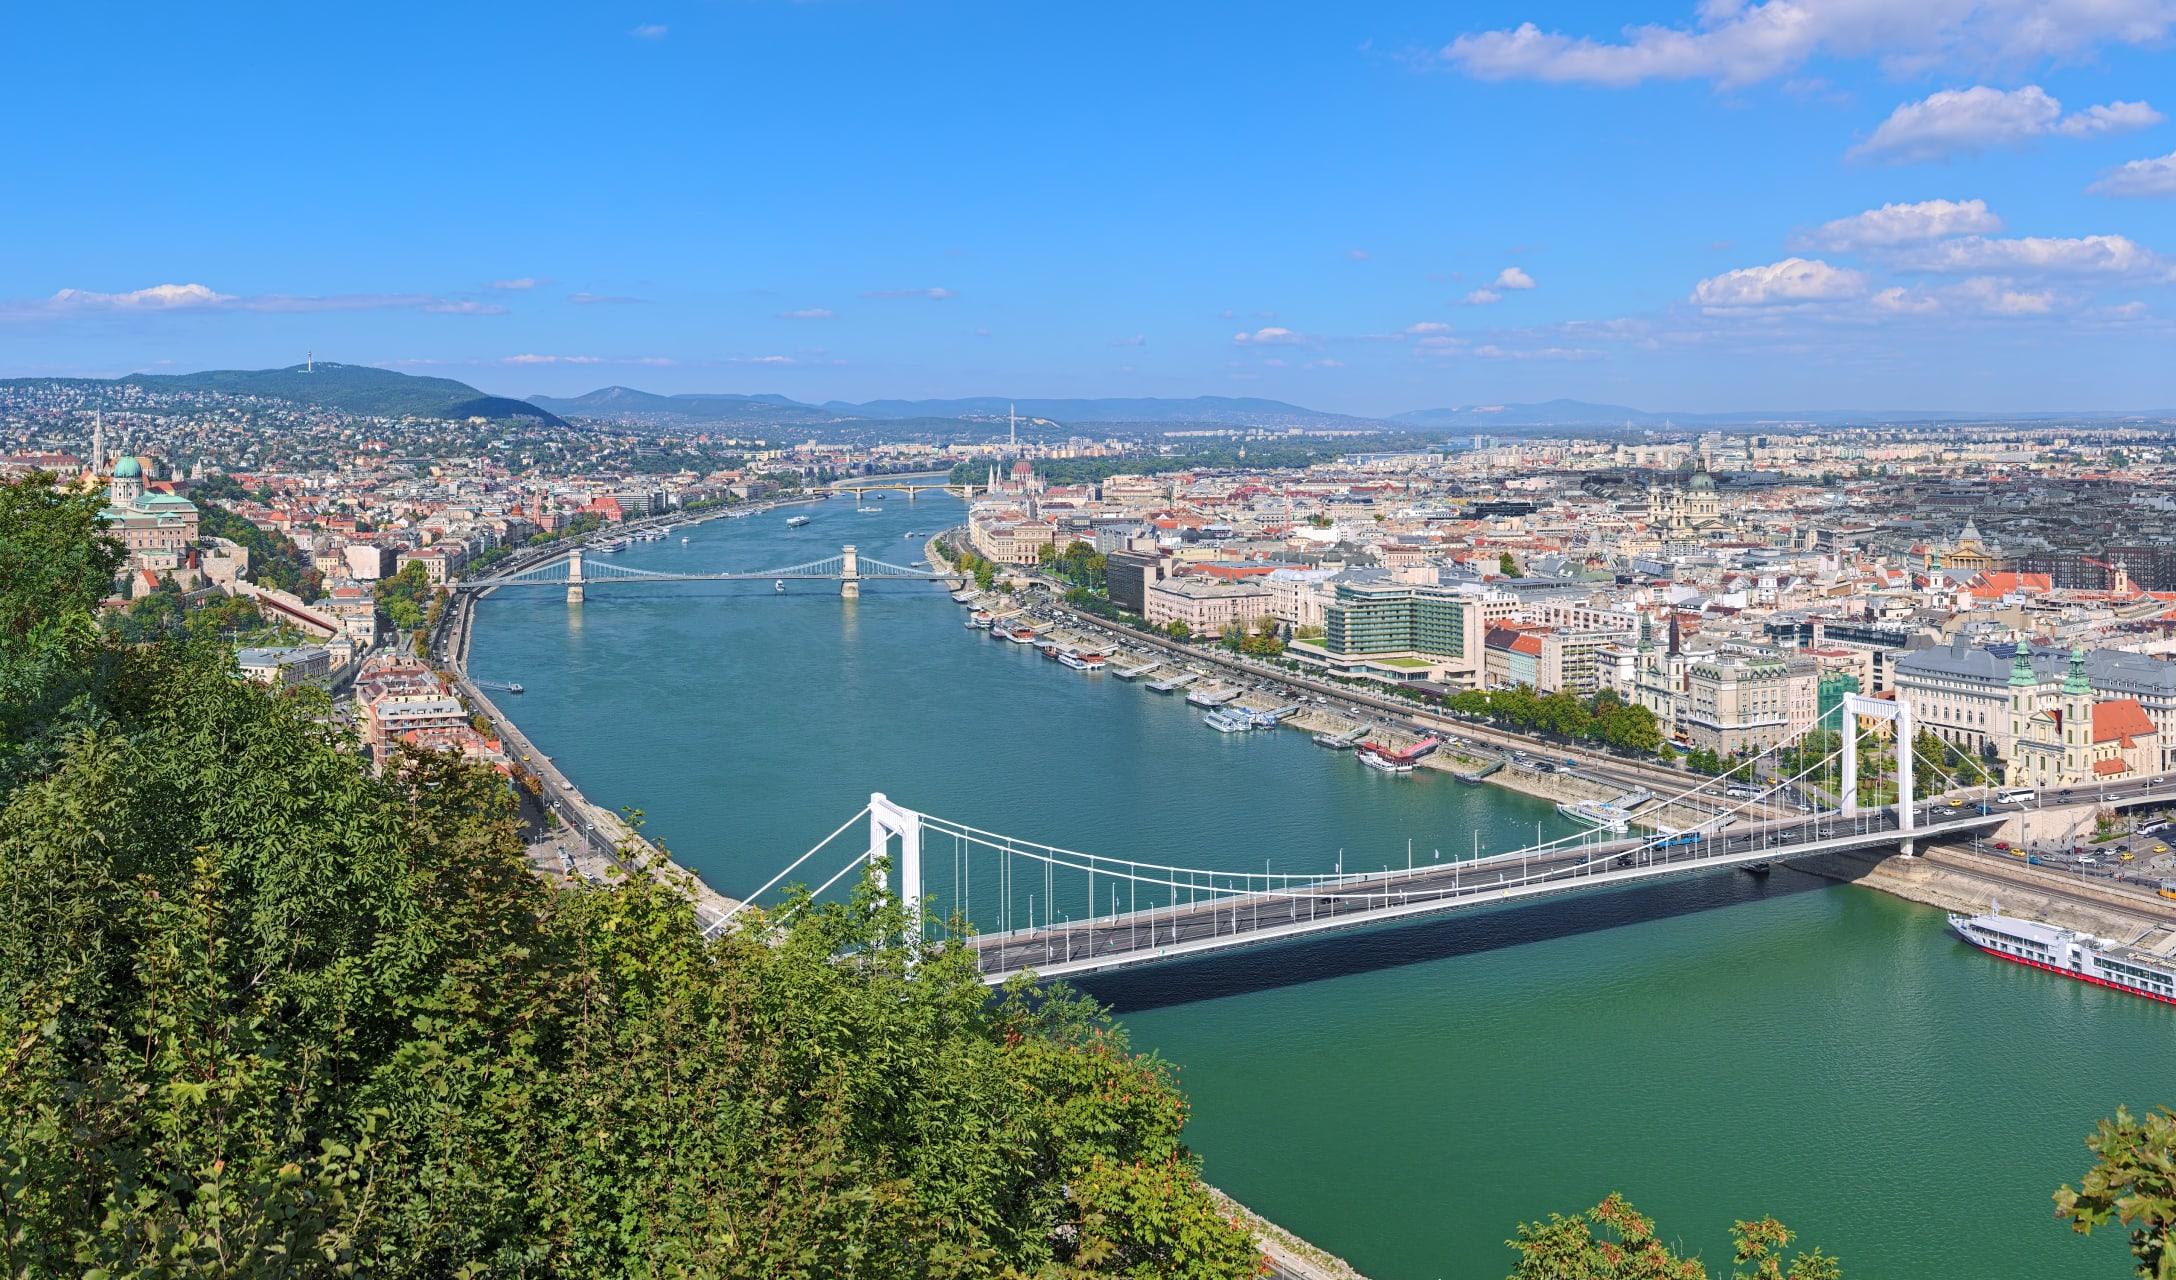 Budapest - The Heart of Budapest and the Elisabeth Bridge